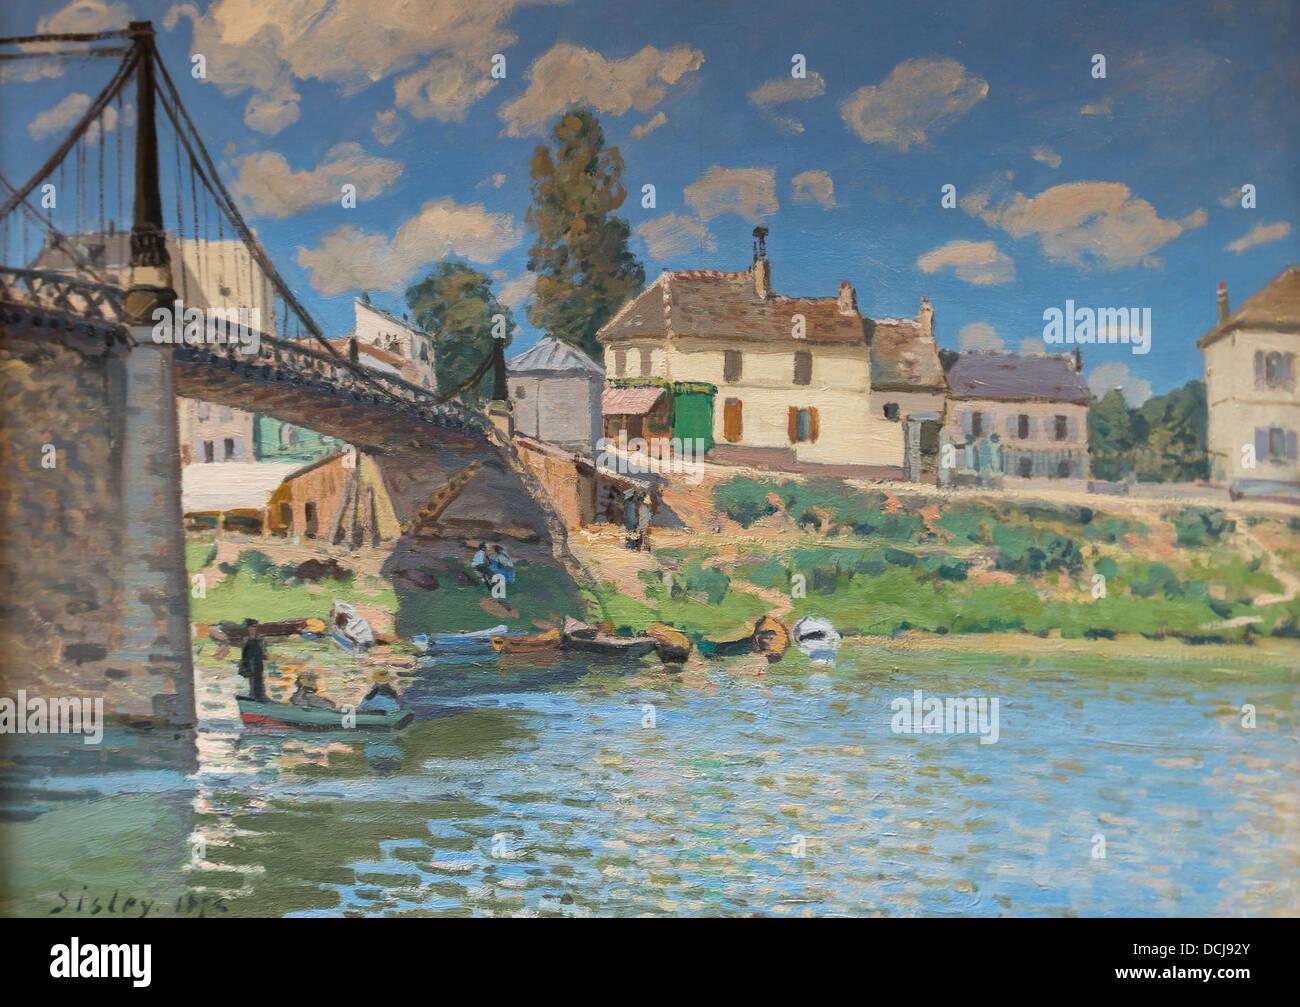 19th century  -  The Bridge at Villeneuve-la-Garenne - Alfred Sisley (1872) - Oil on canvas - Stock Image